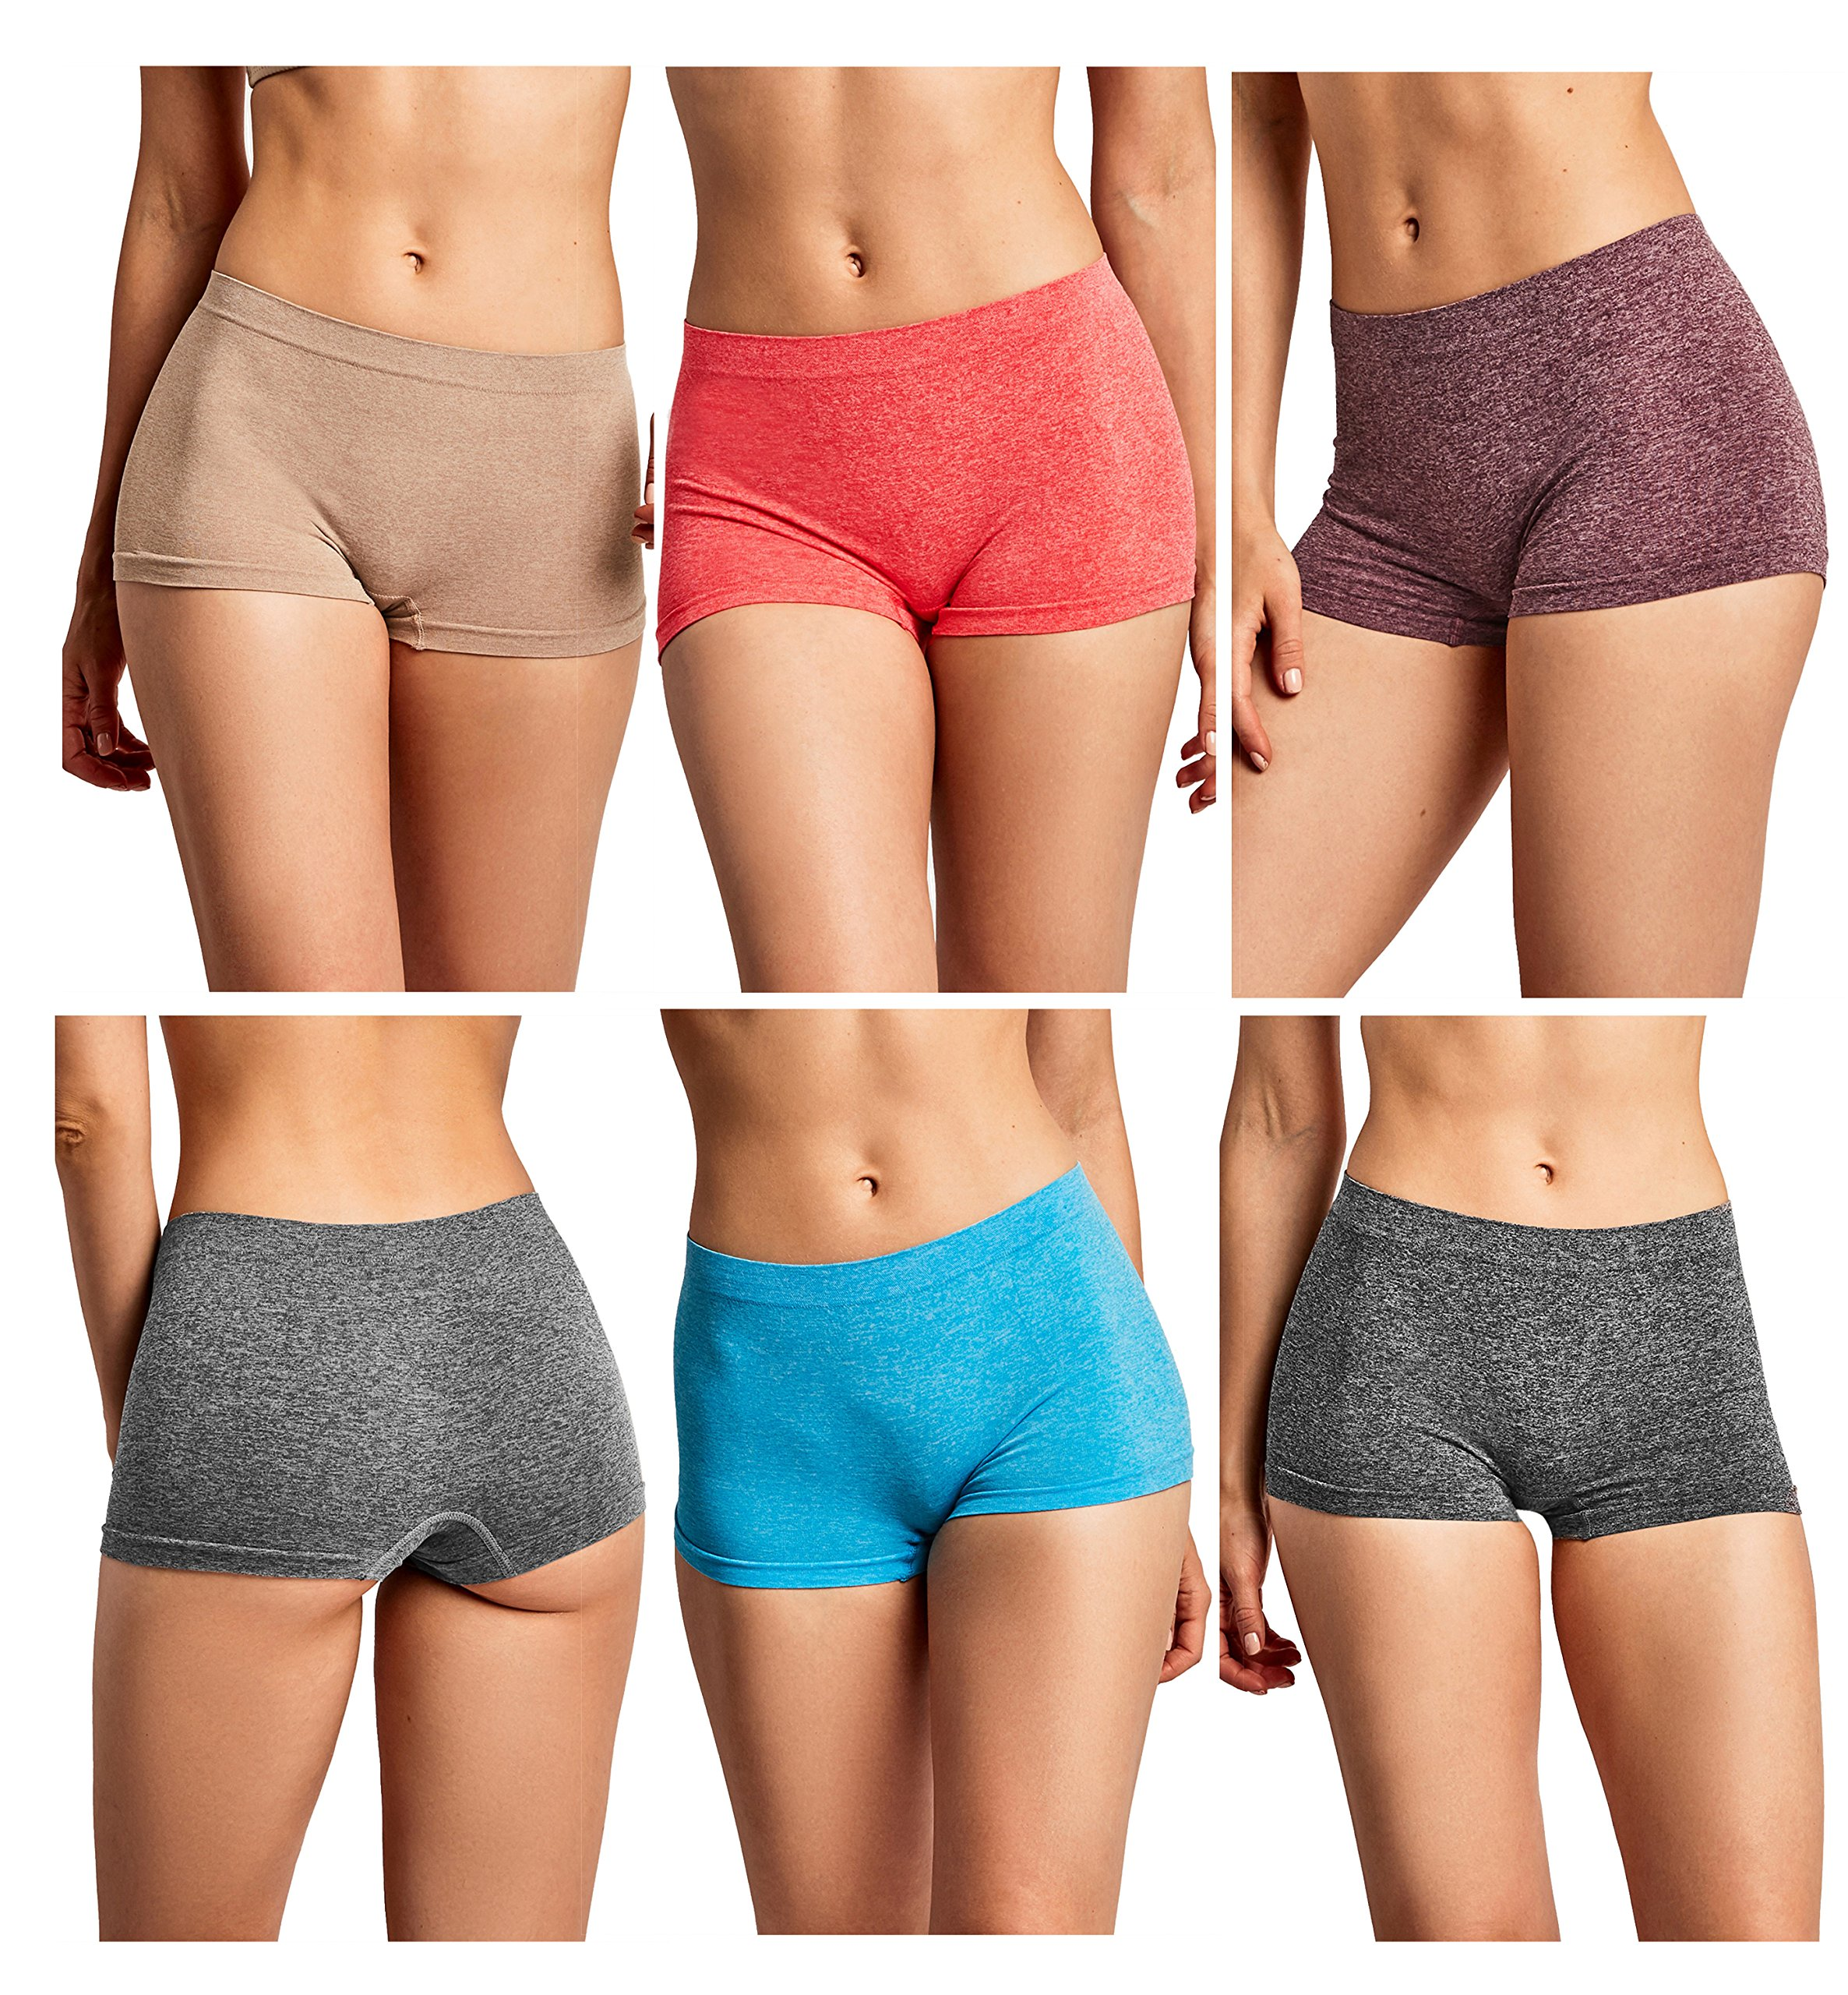 Gilbins Women Seamless Stretch Boy Shorts Panties Various Styles (Heather 1)